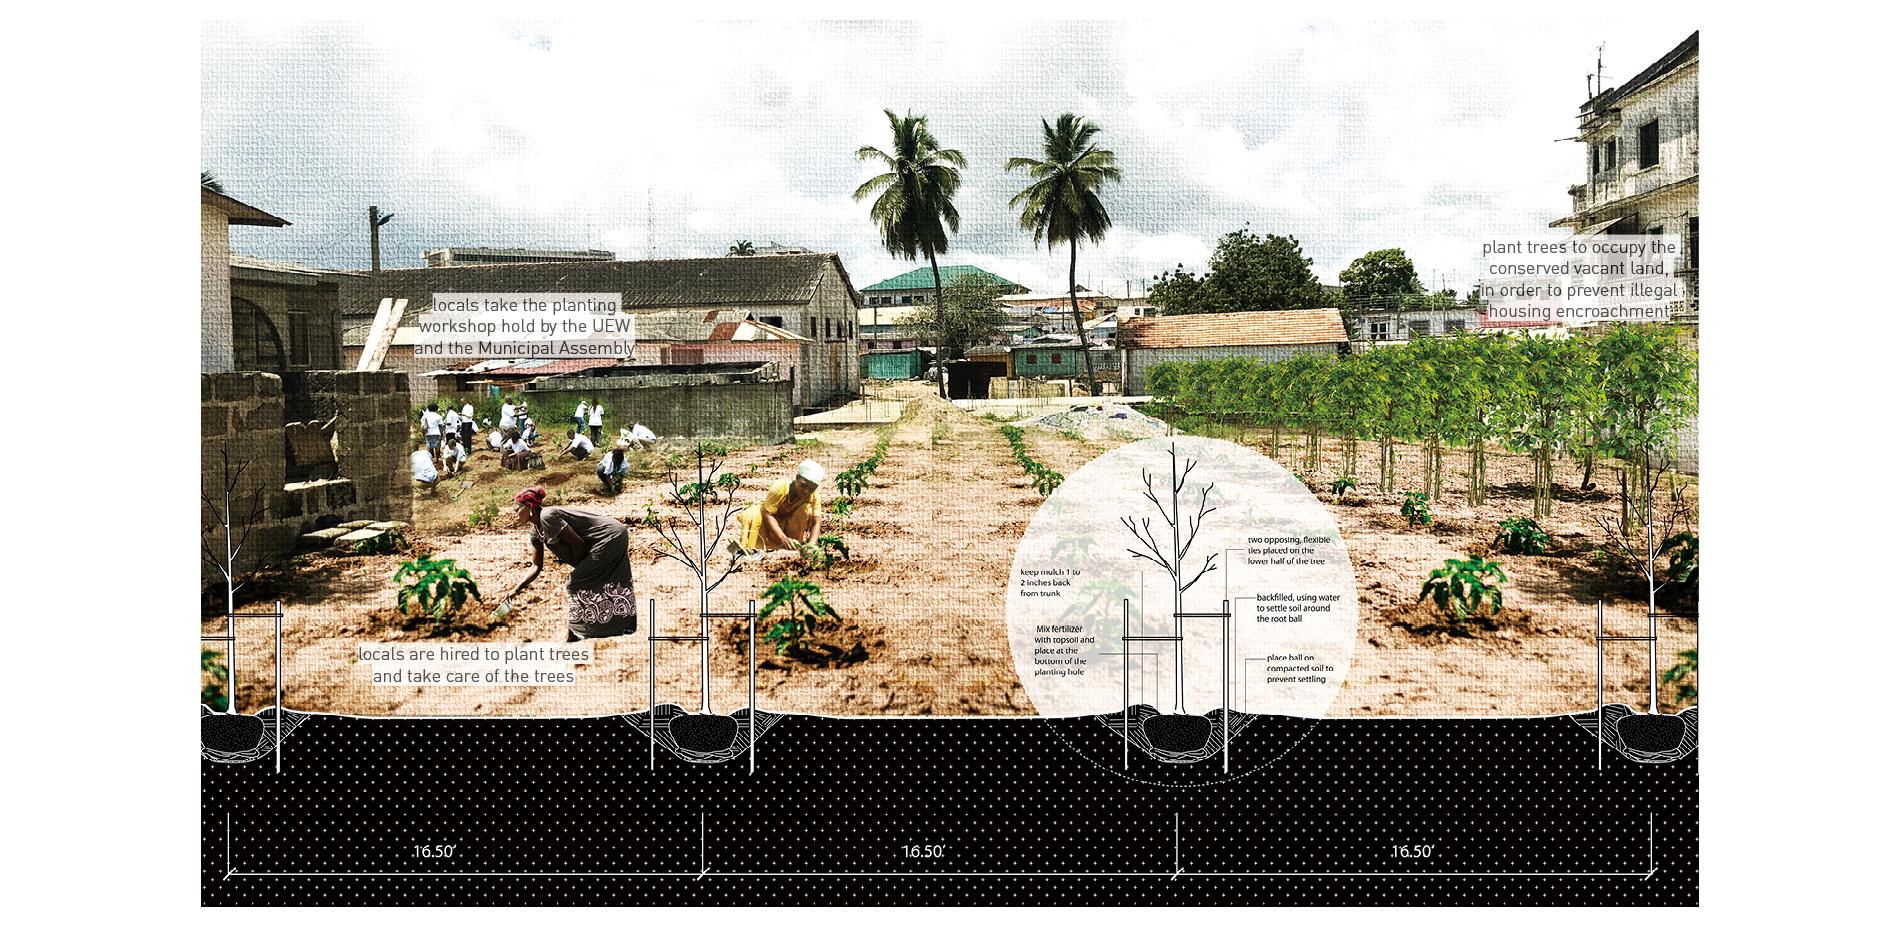 Phase 1 Pilot Project: The mango community